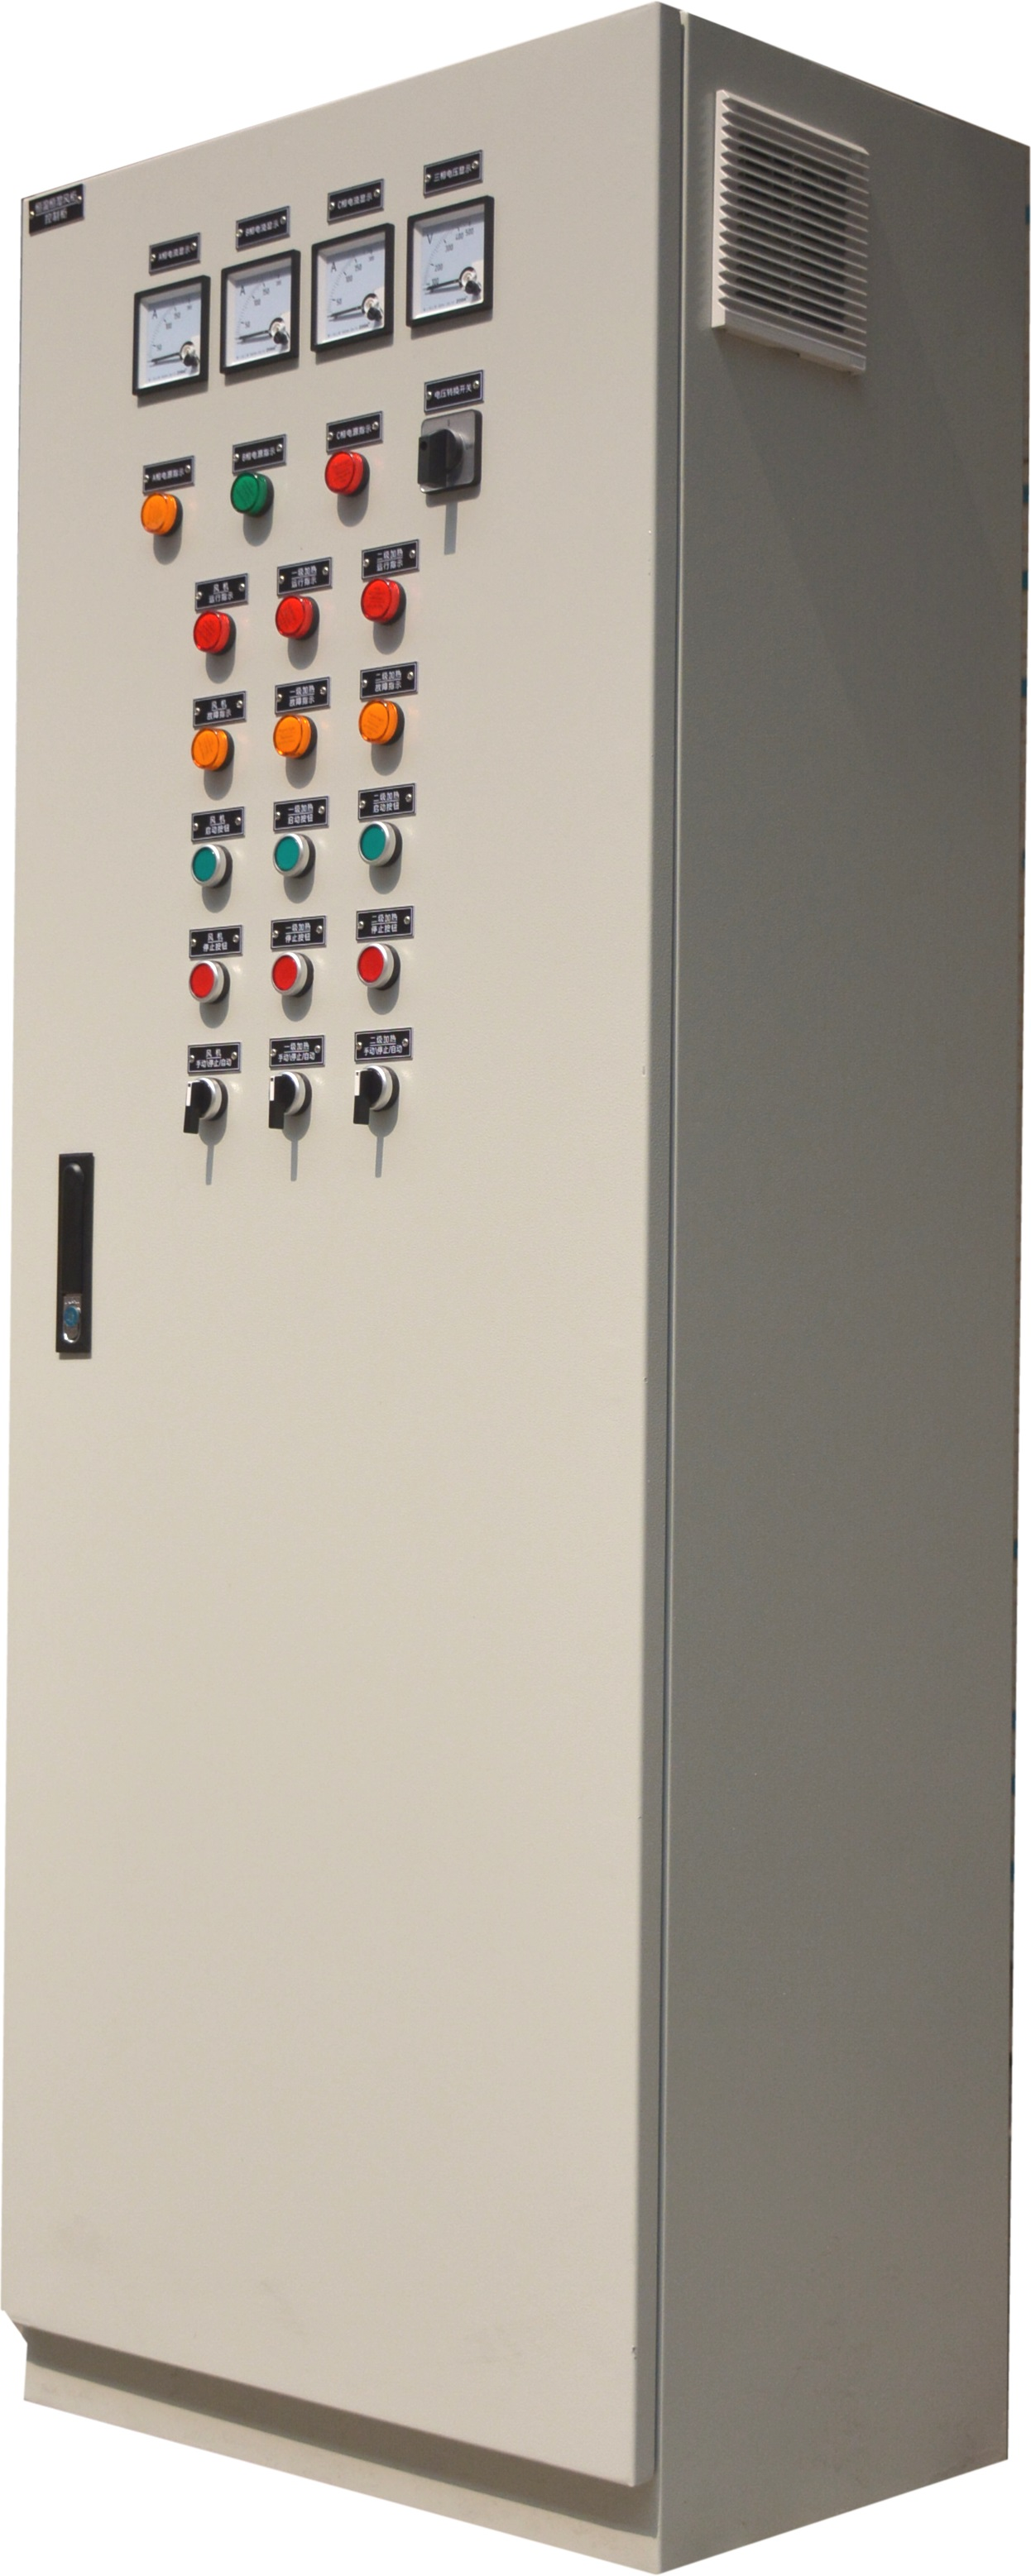 Sewage treatment control cabinet